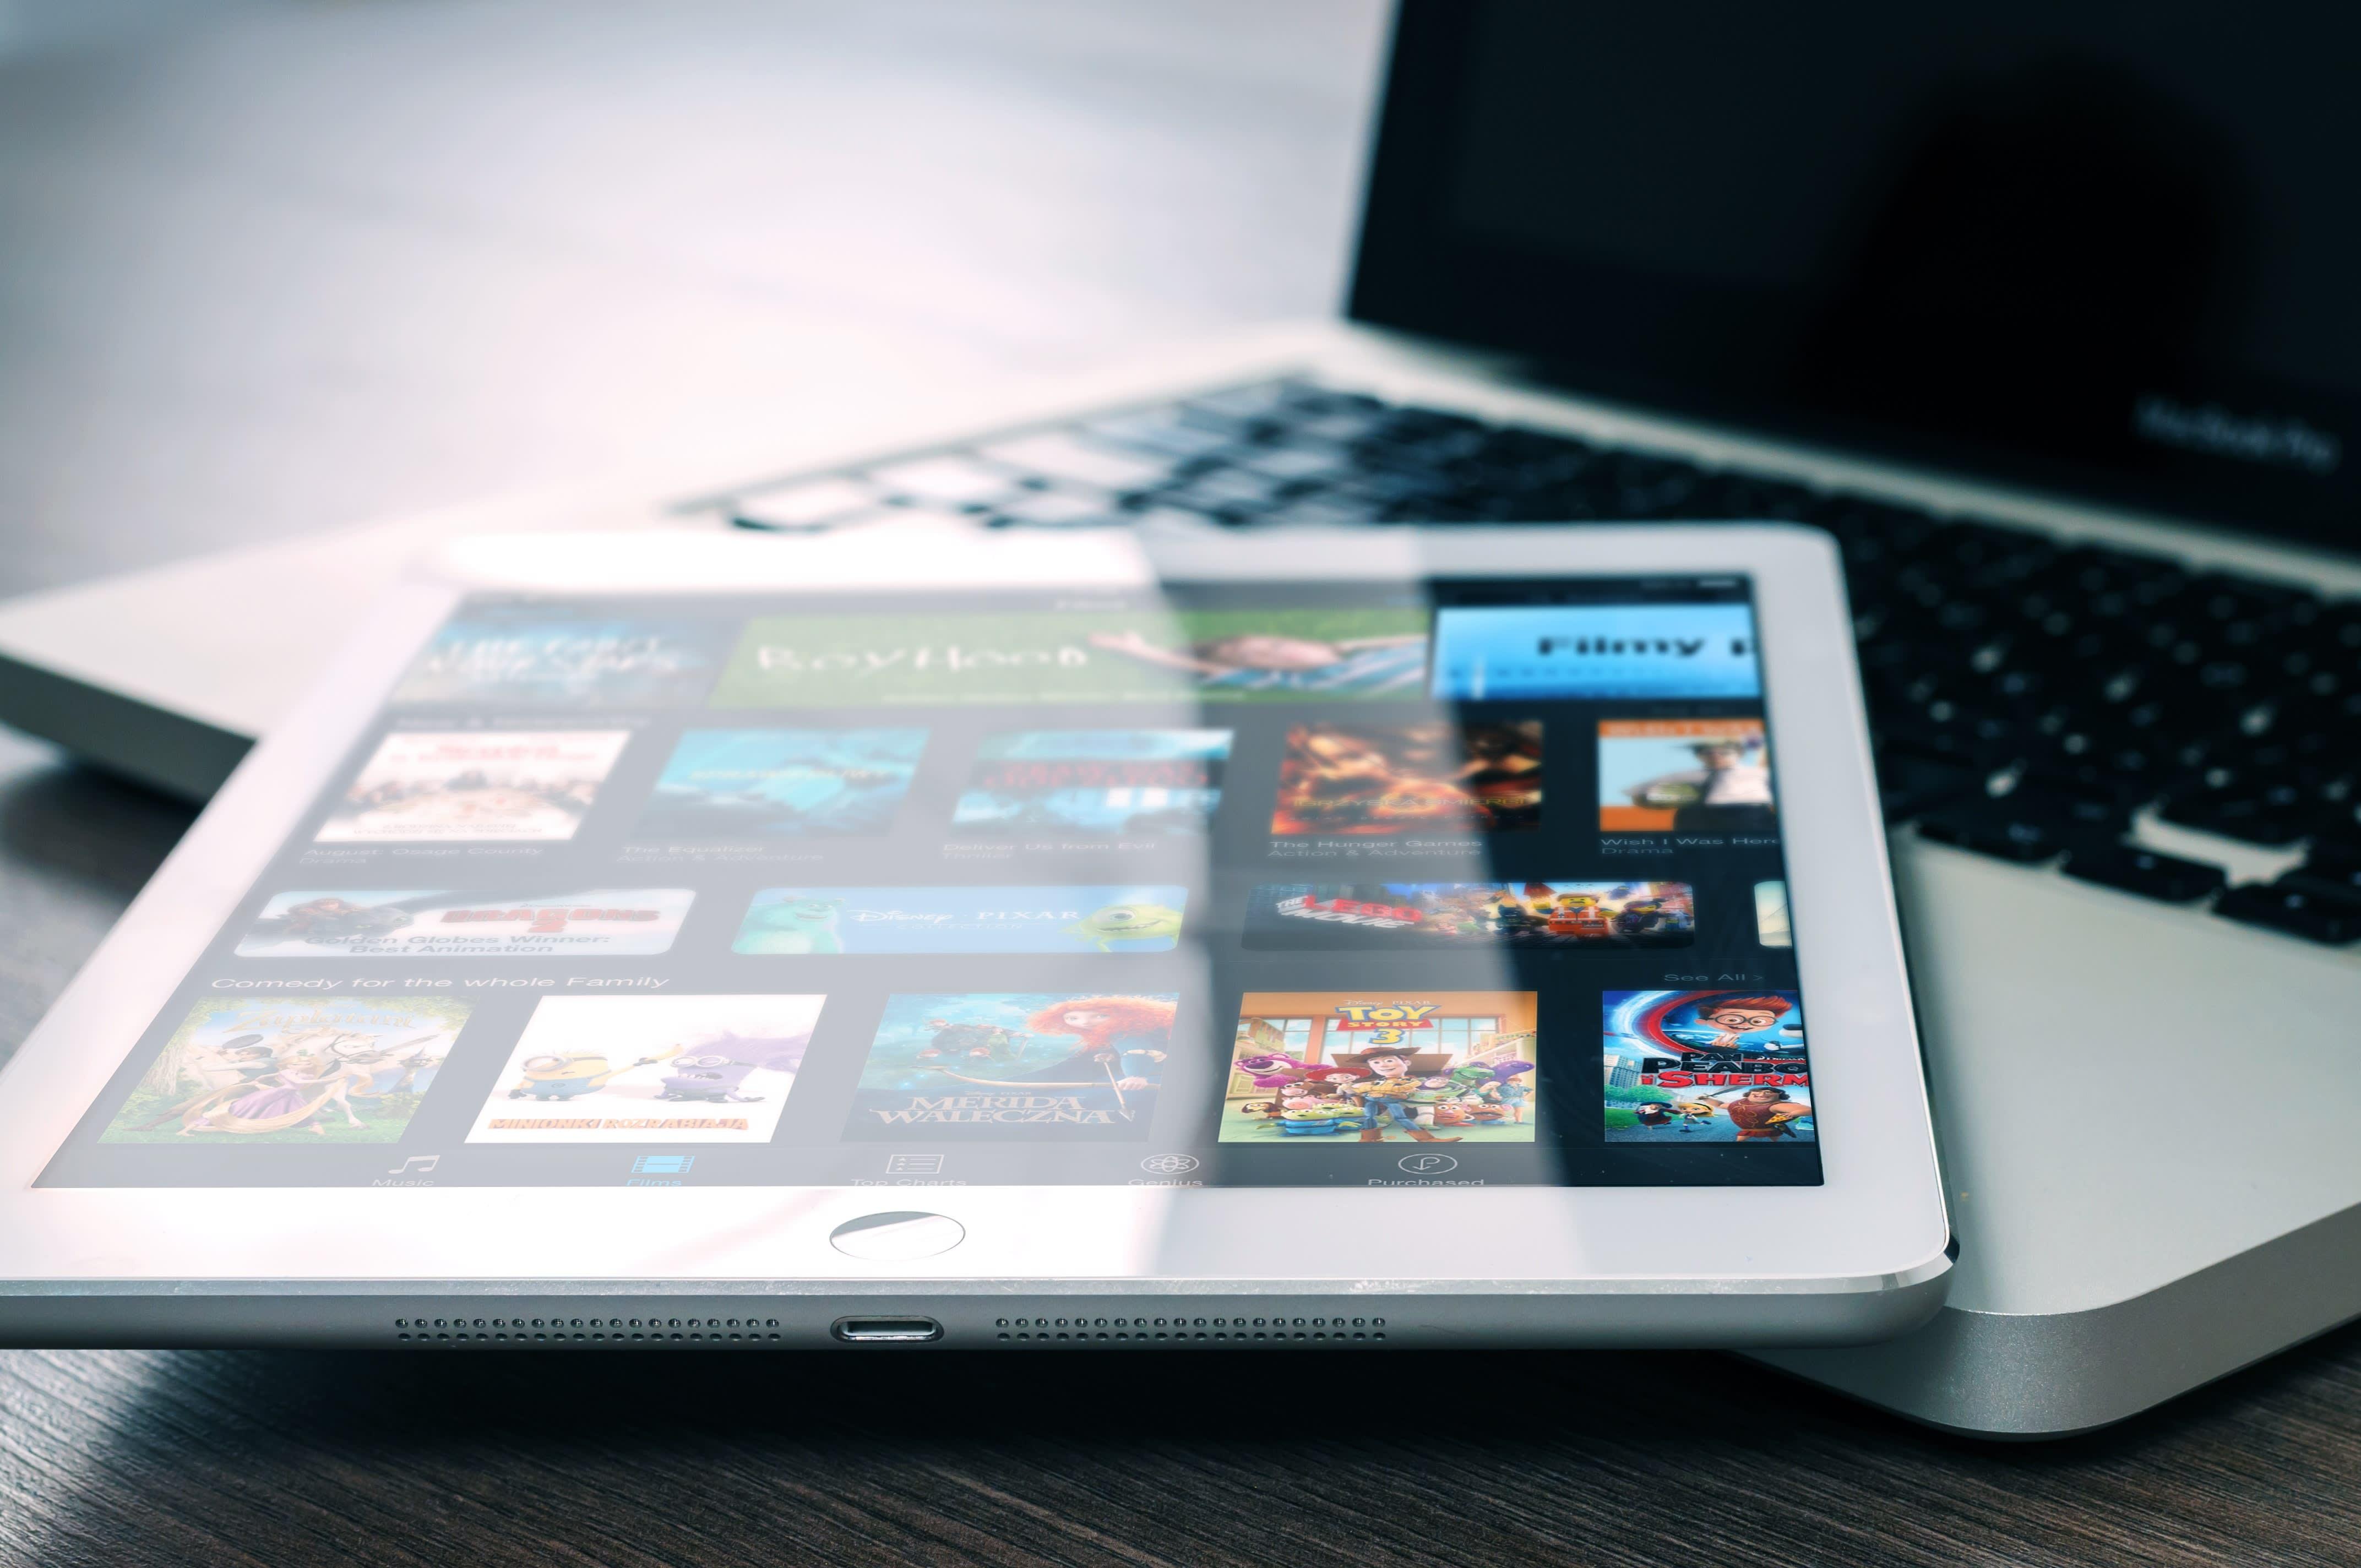 LEBC adviser app launches for £15 a year